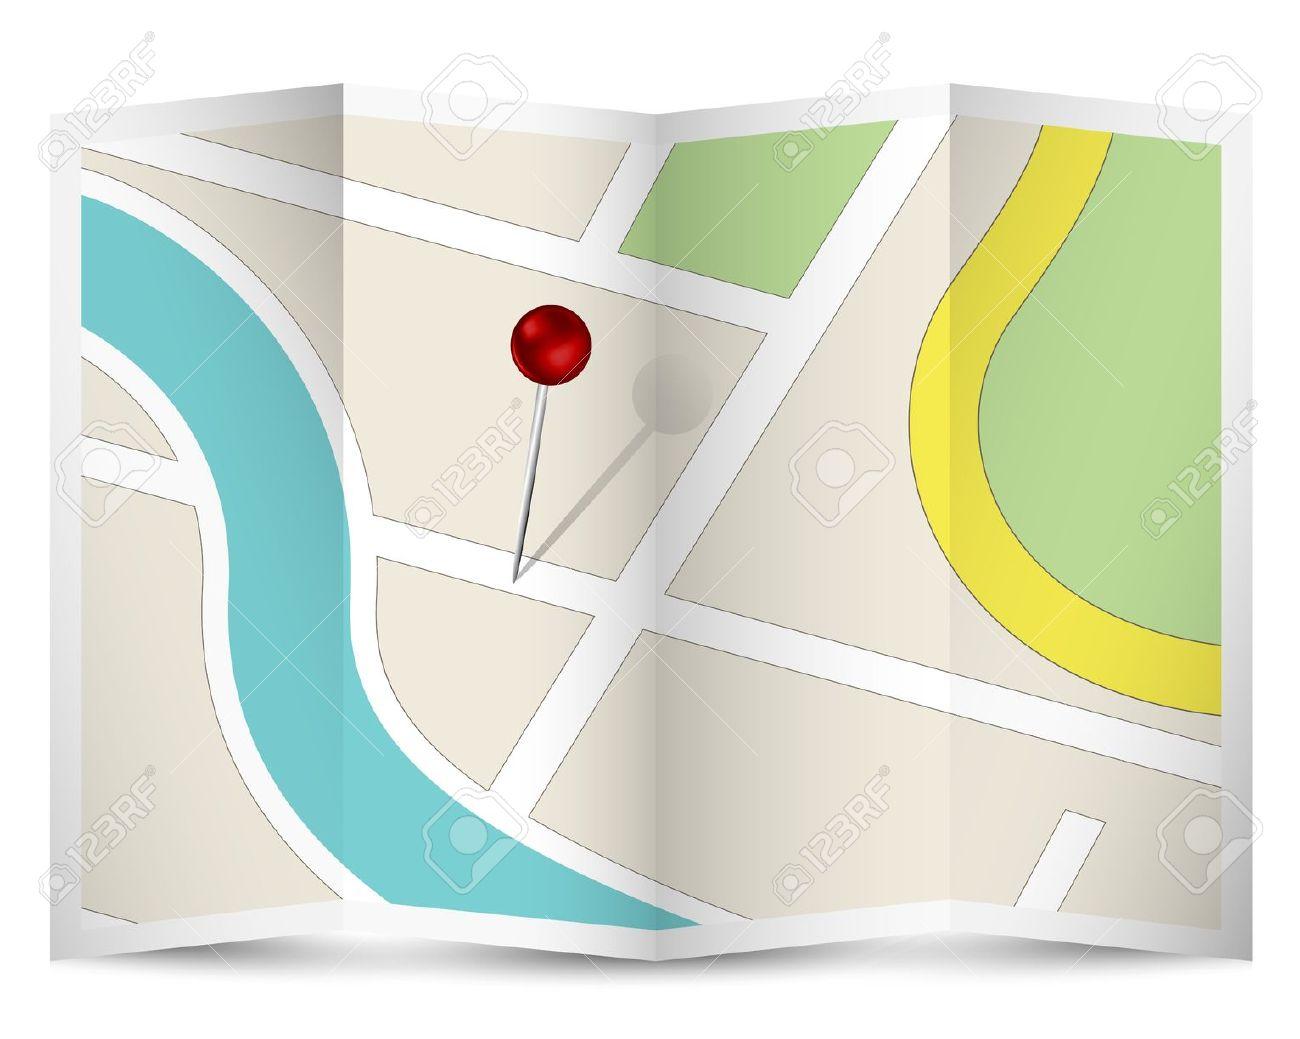 Folded road map clipart png Namericaglobebwprint Free Jpg Be Royalty Blank Printed Earth ... png